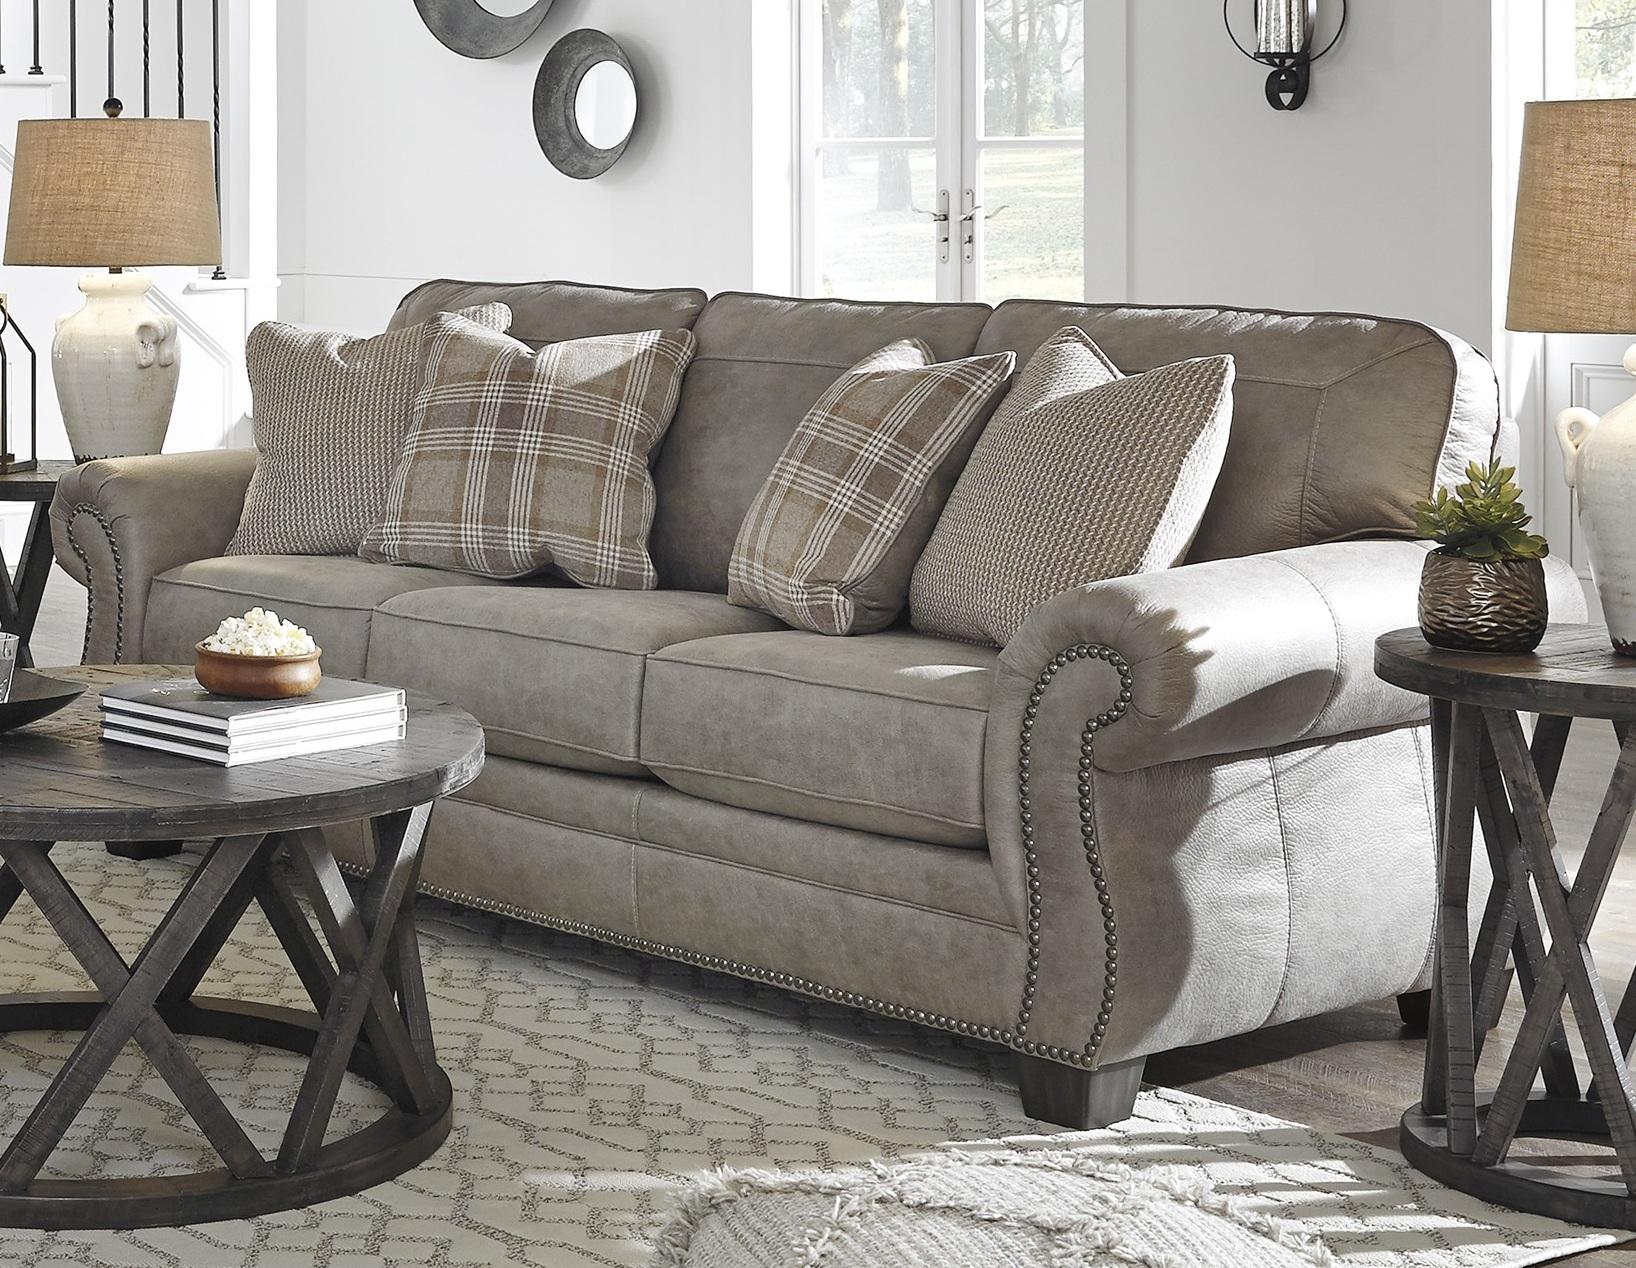 American Design Furnituremonroe – Aspen Leather Sofa In Aspen Leather Sofas (View 3 of 15)